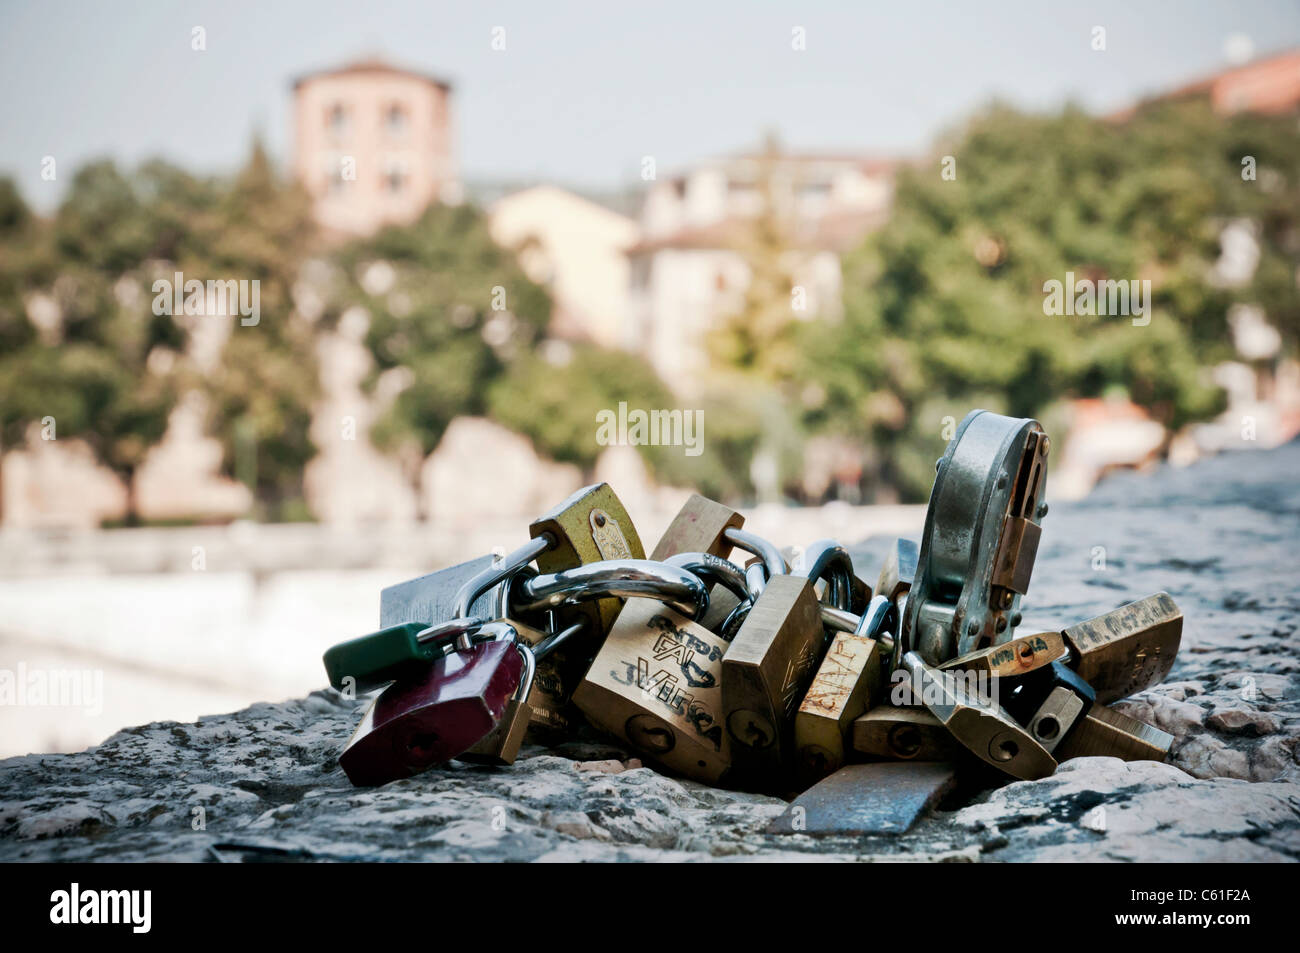 Liebe Vorhängeschlösser an den Stein Brücke, Verona Italien gebunden Stockbild